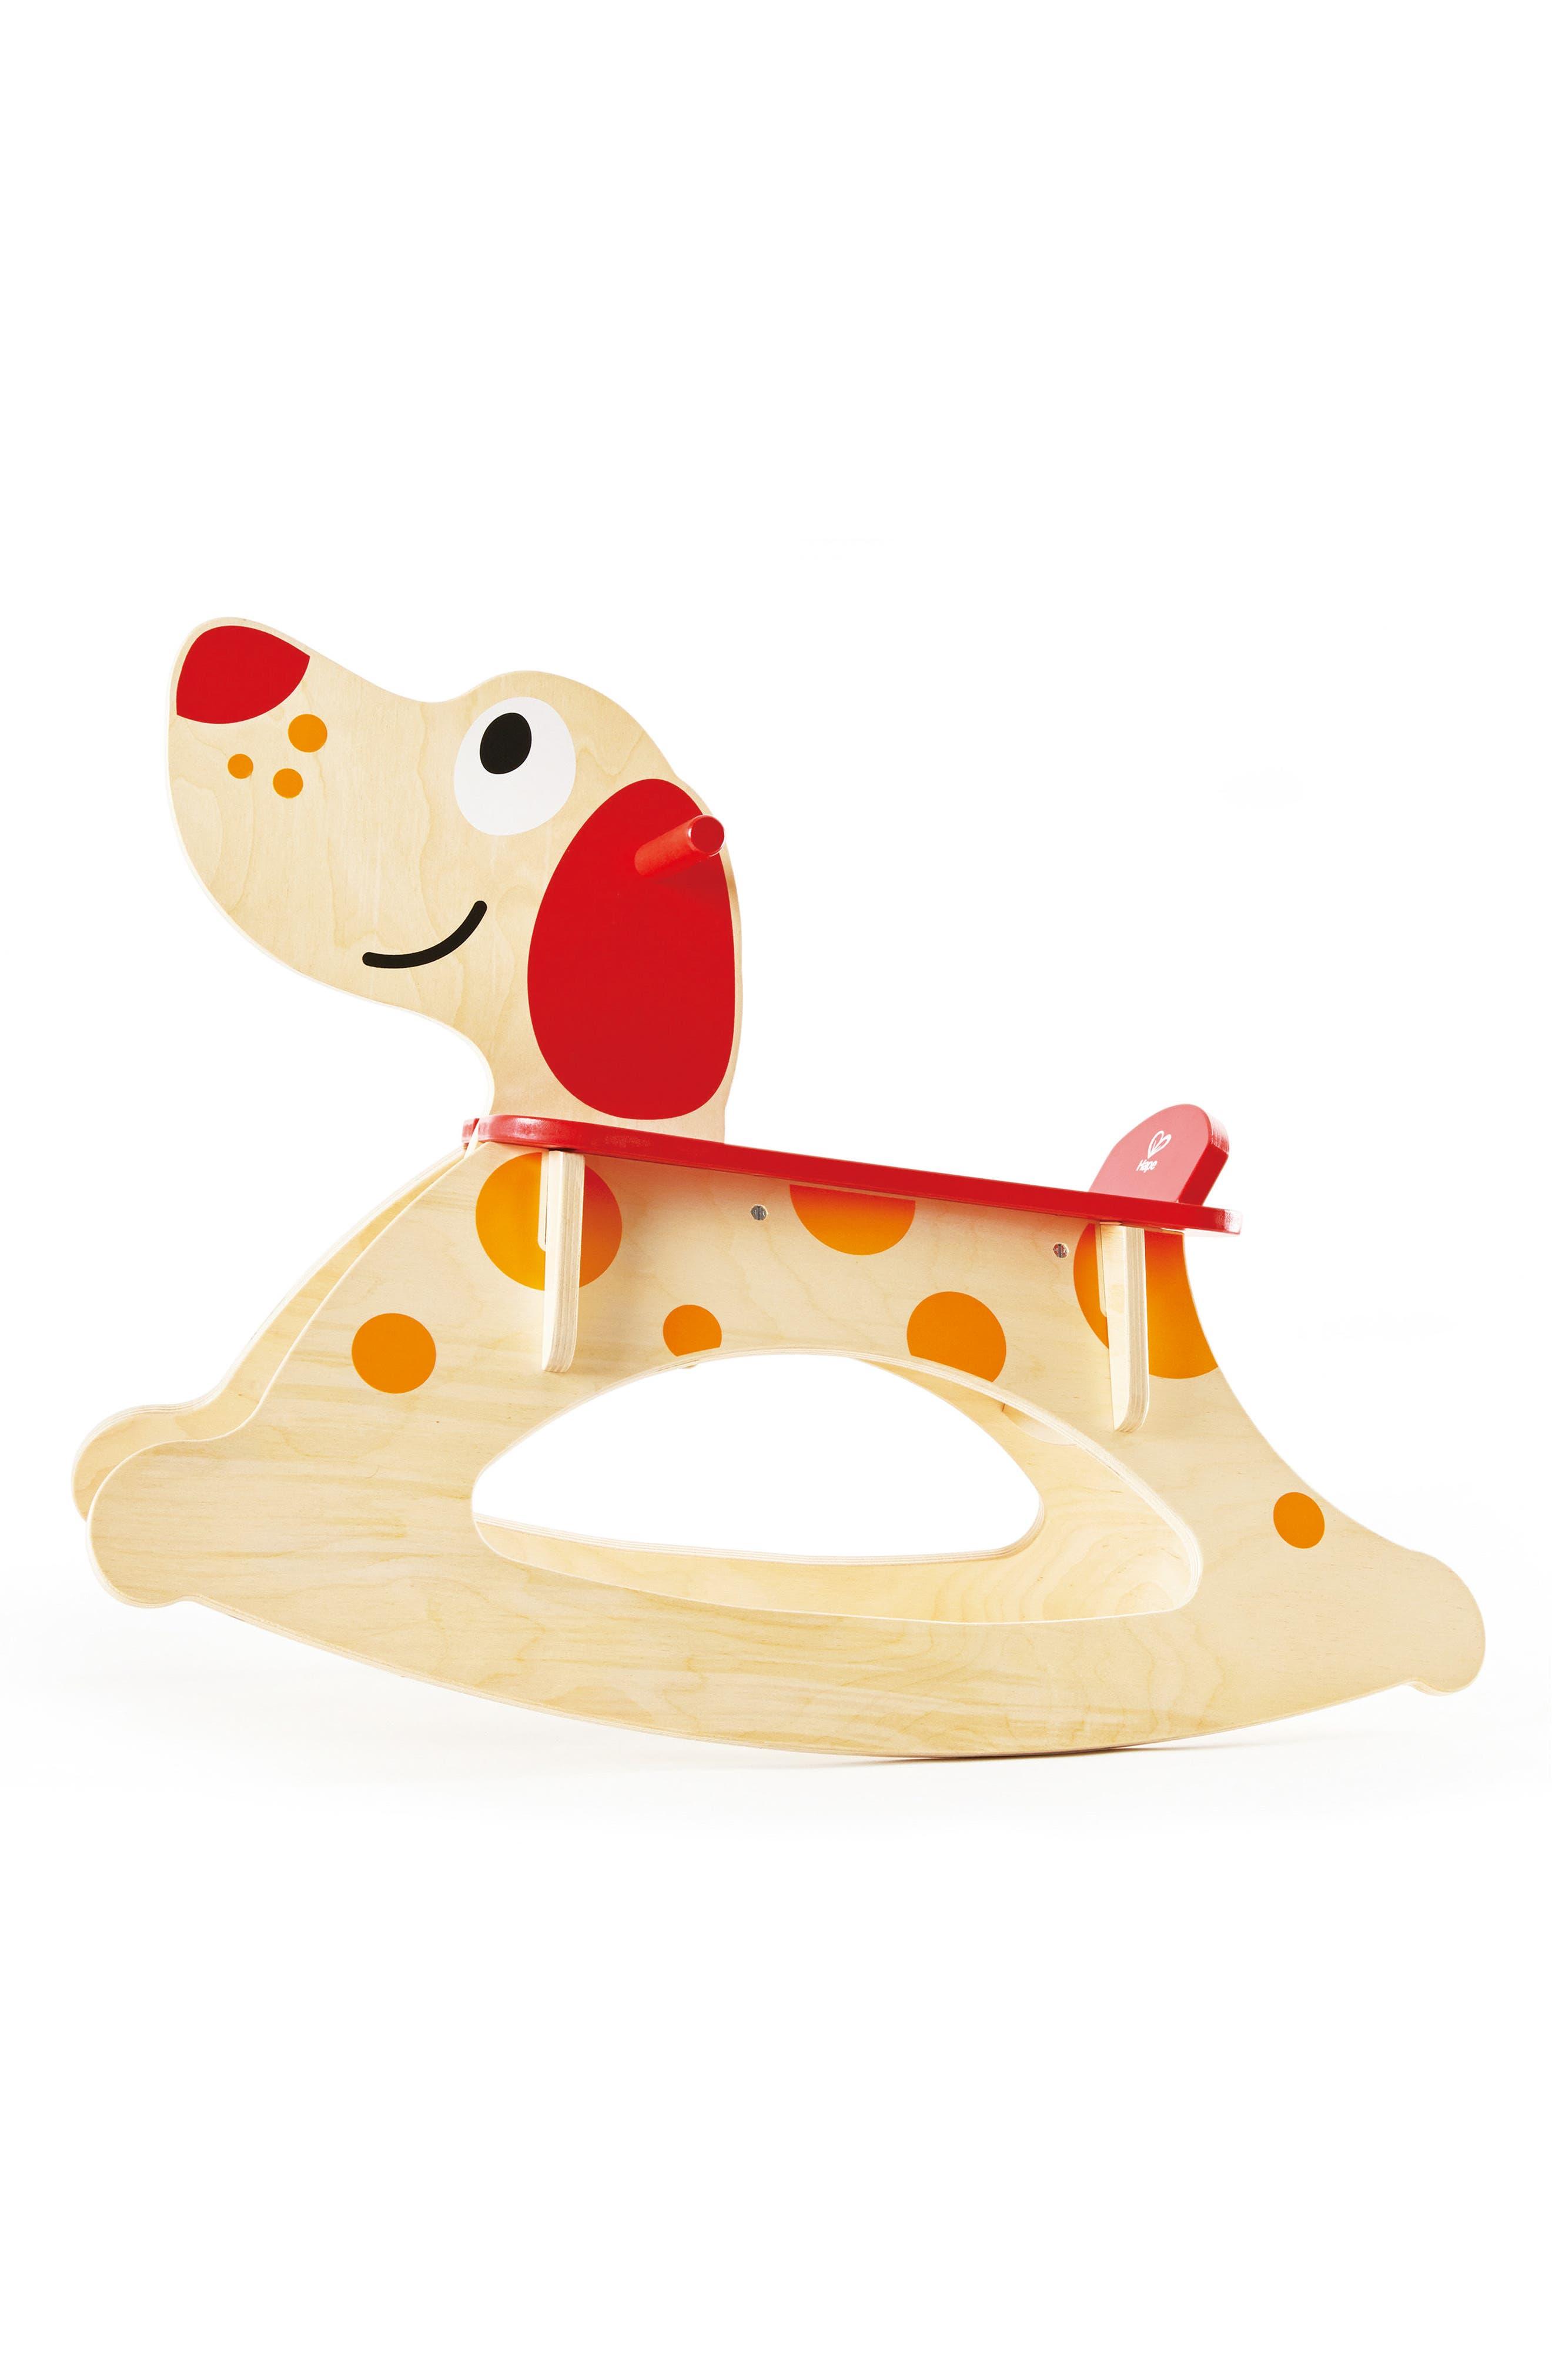 Rock-A-Long Puppy Ride-On,                             Main thumbnail 1, color,                             Tan